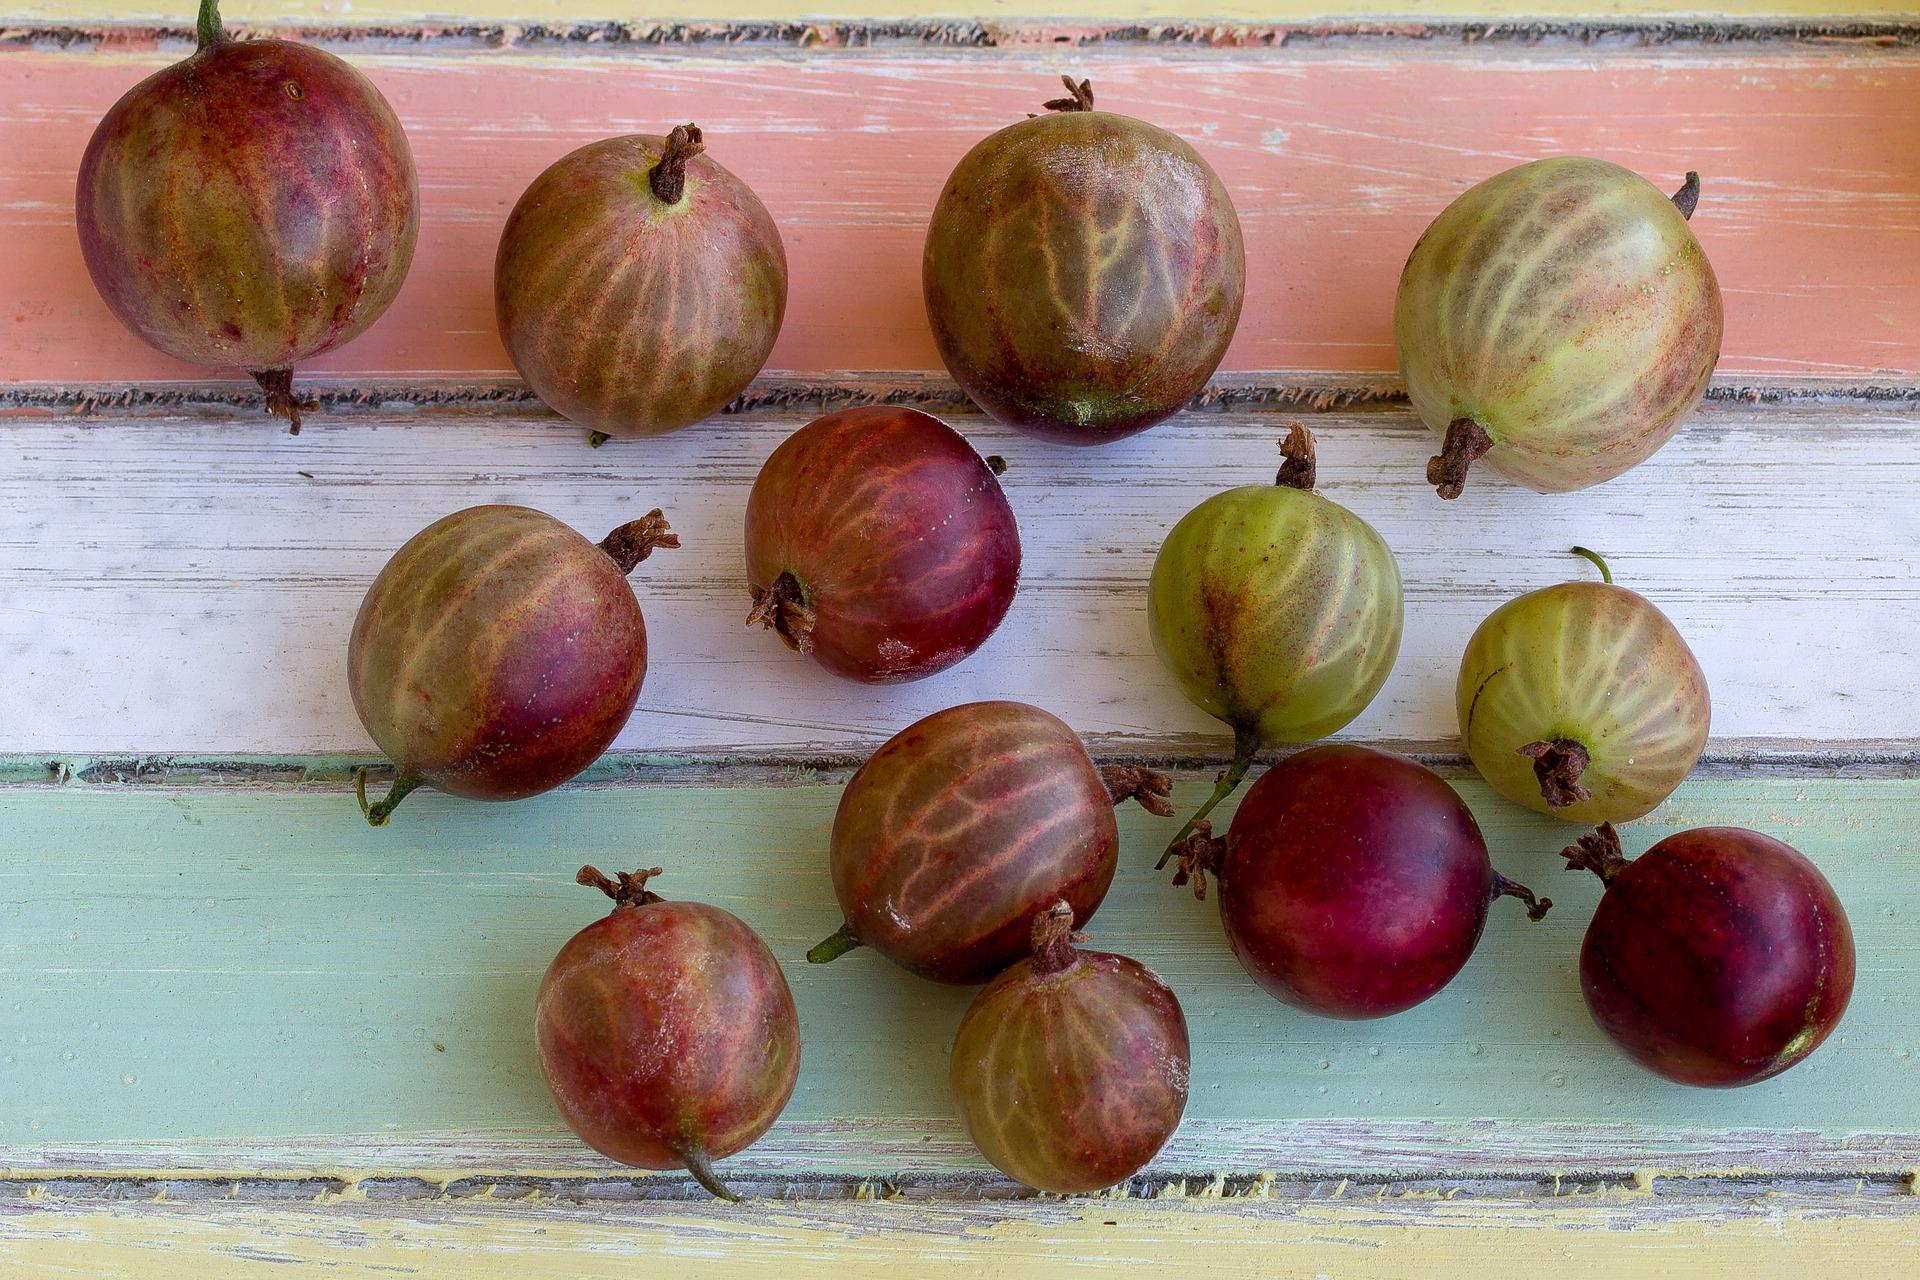 fruits-1533757_1920.jpg